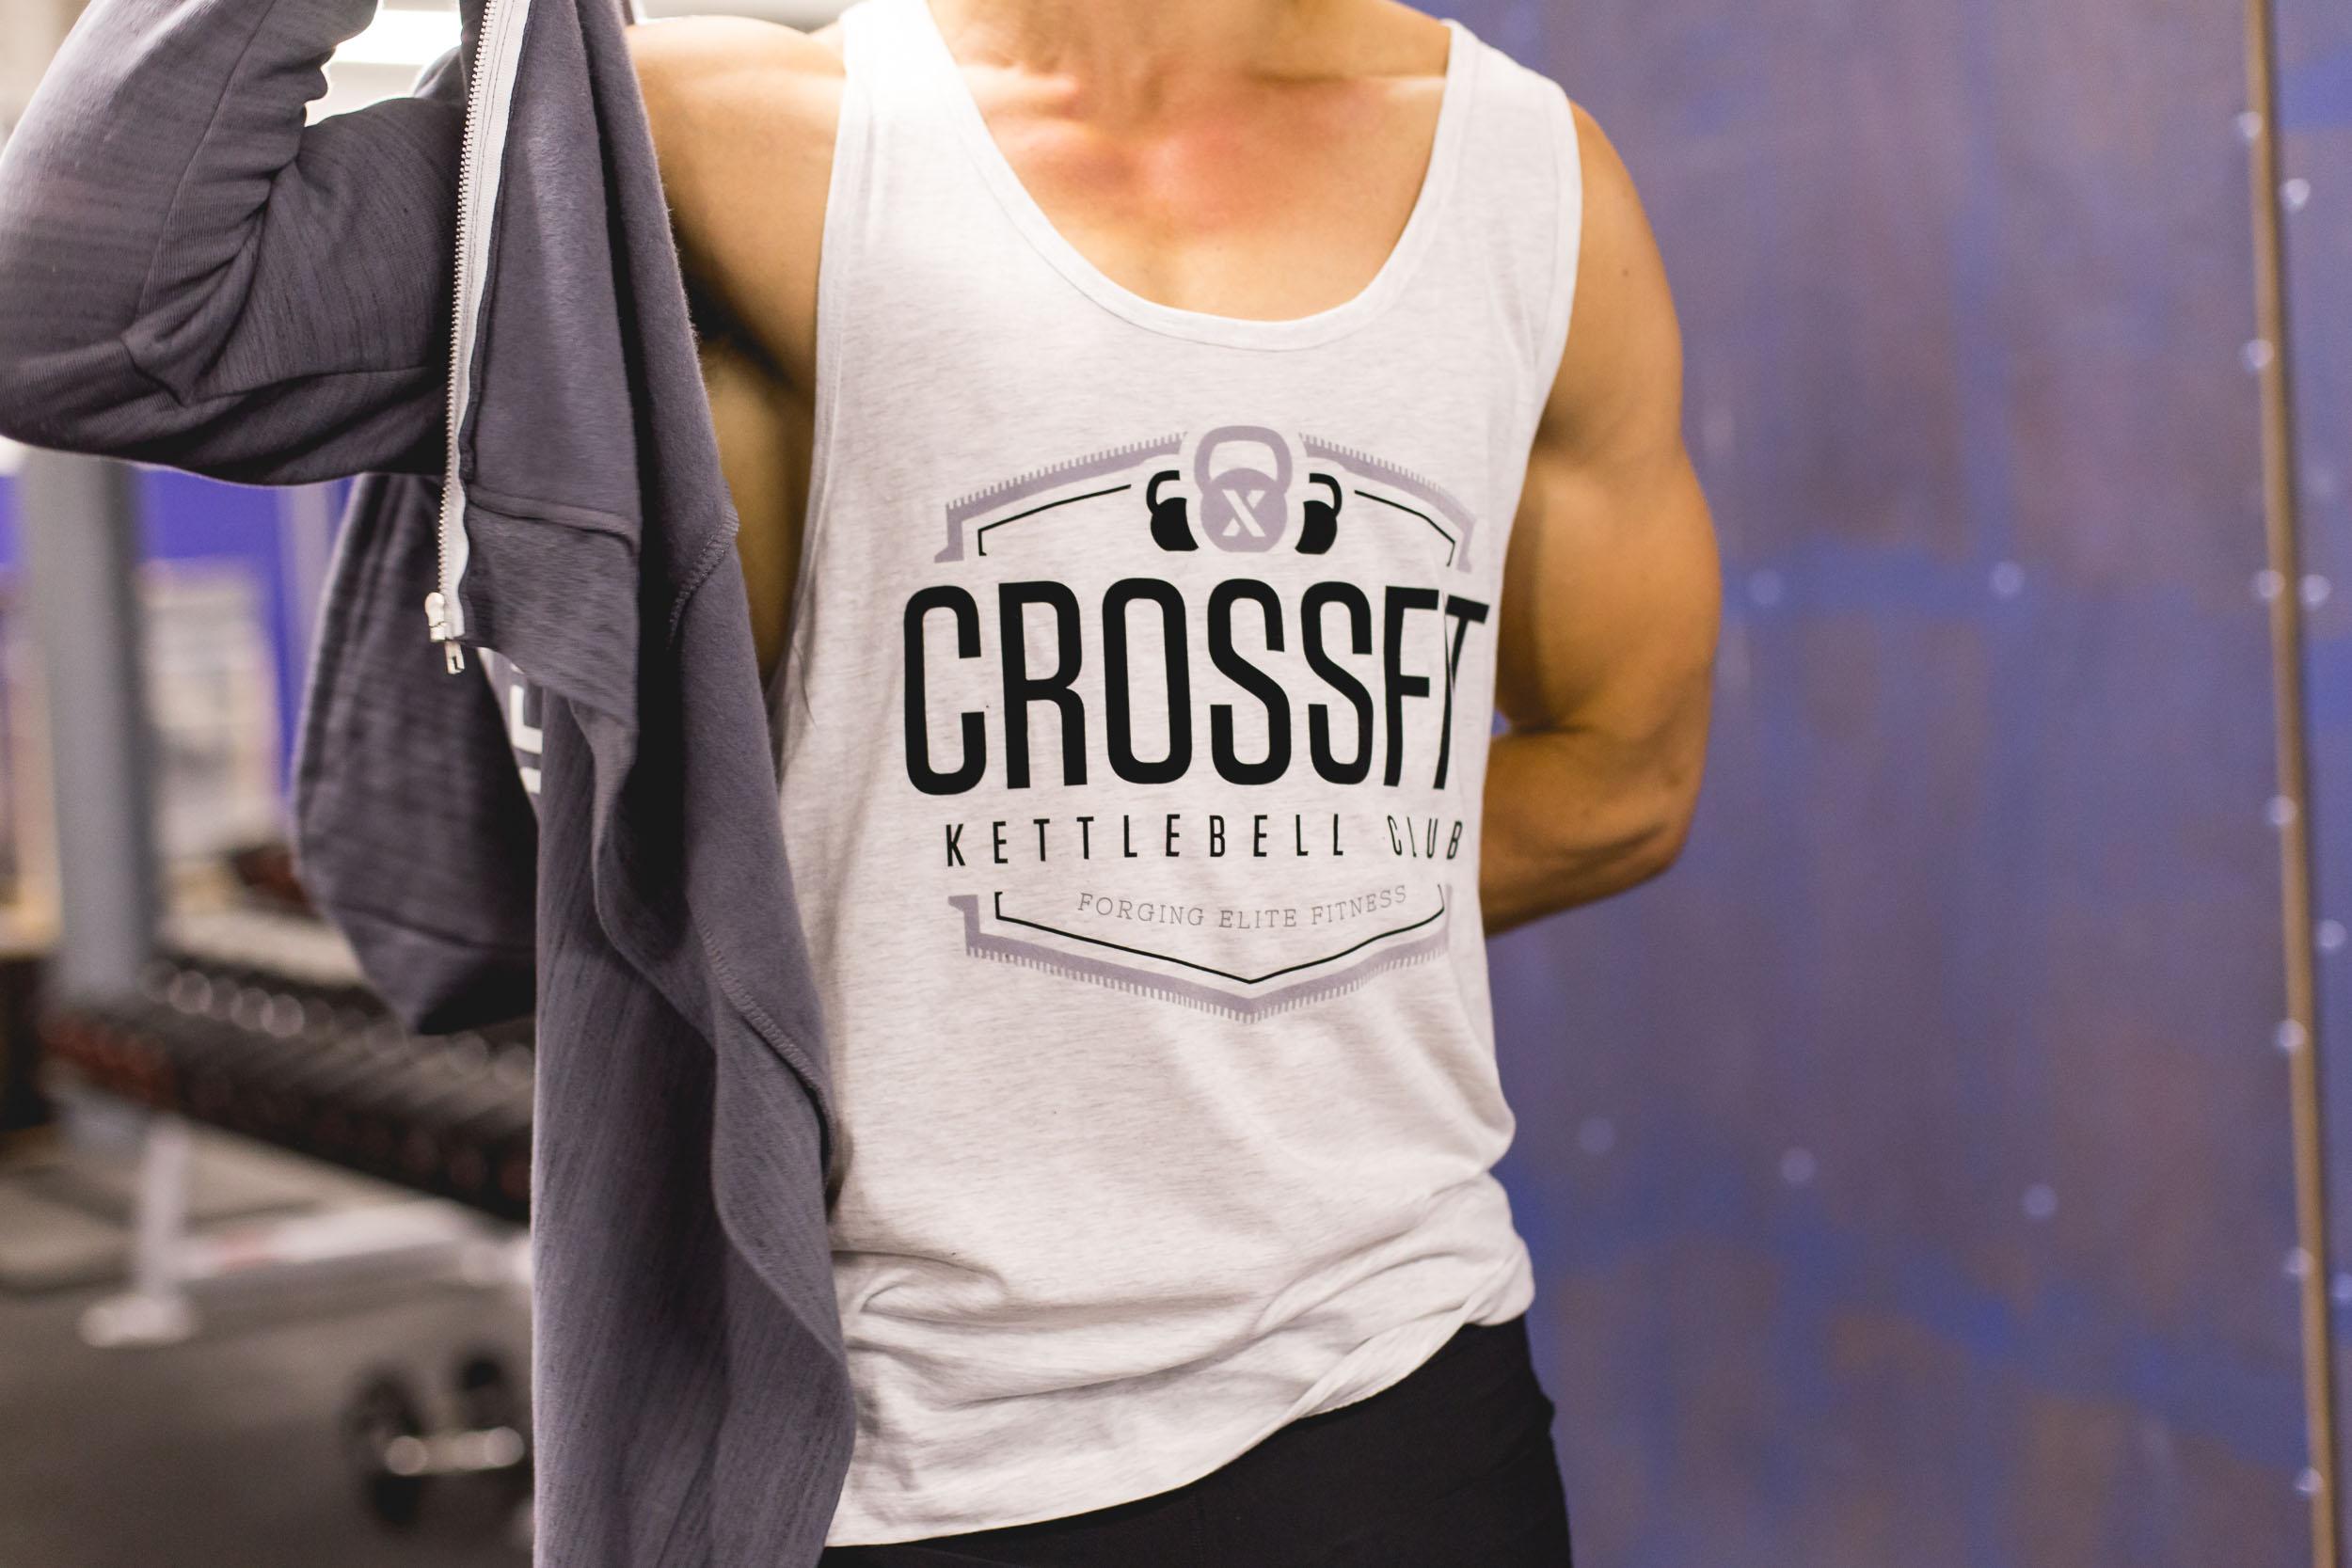 Crossfit UK printed clothing t-shirts-0034.jpg